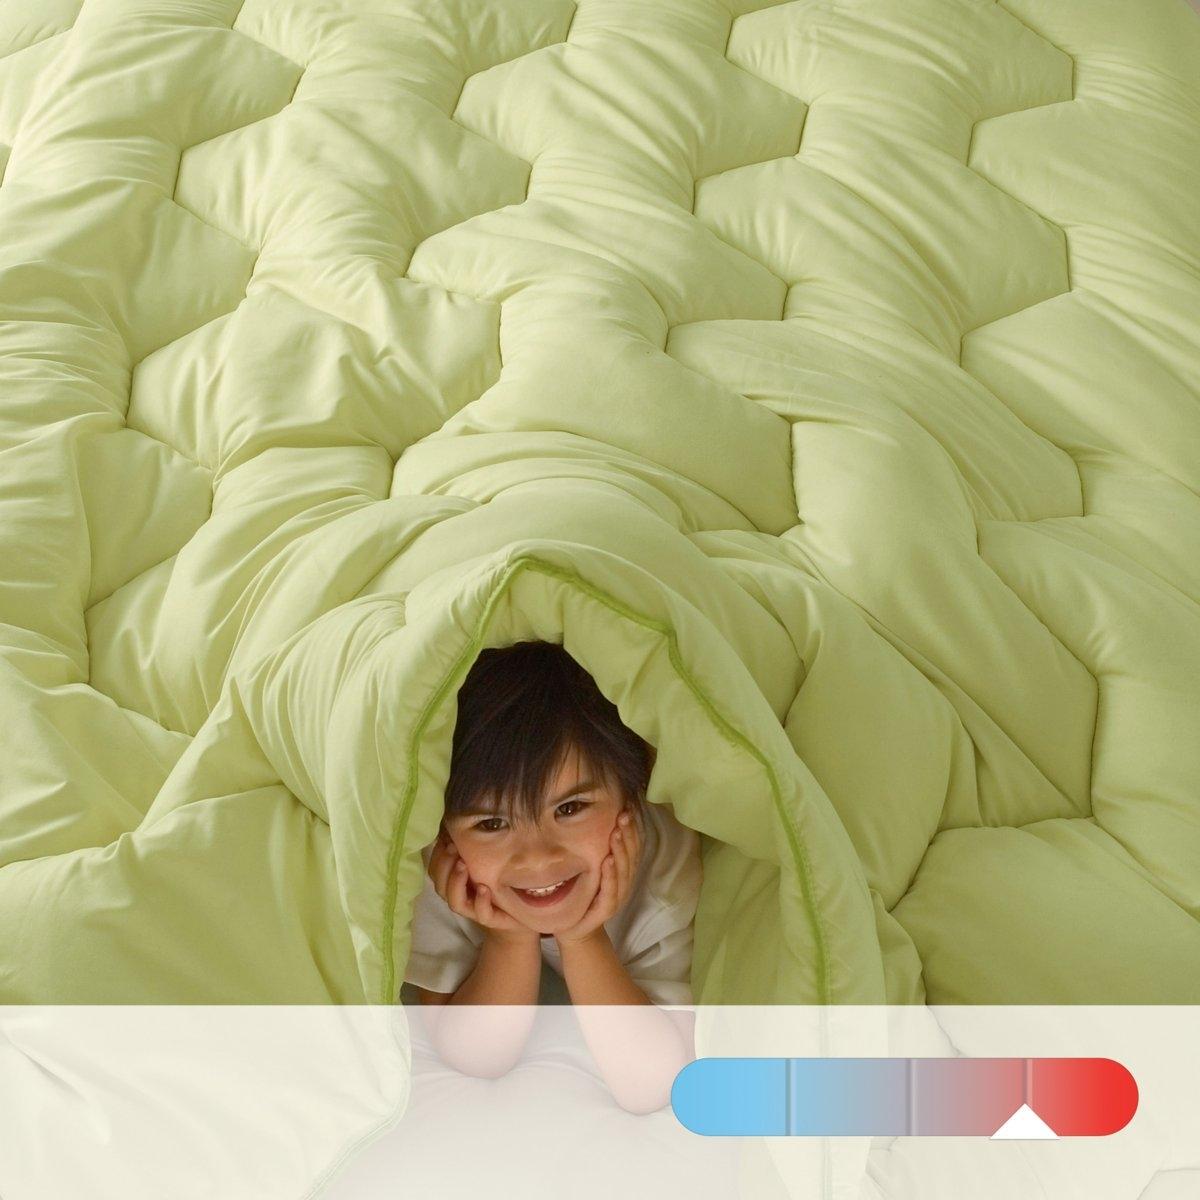 Одеяло COLOR 100% полиэстера, 500 гм²